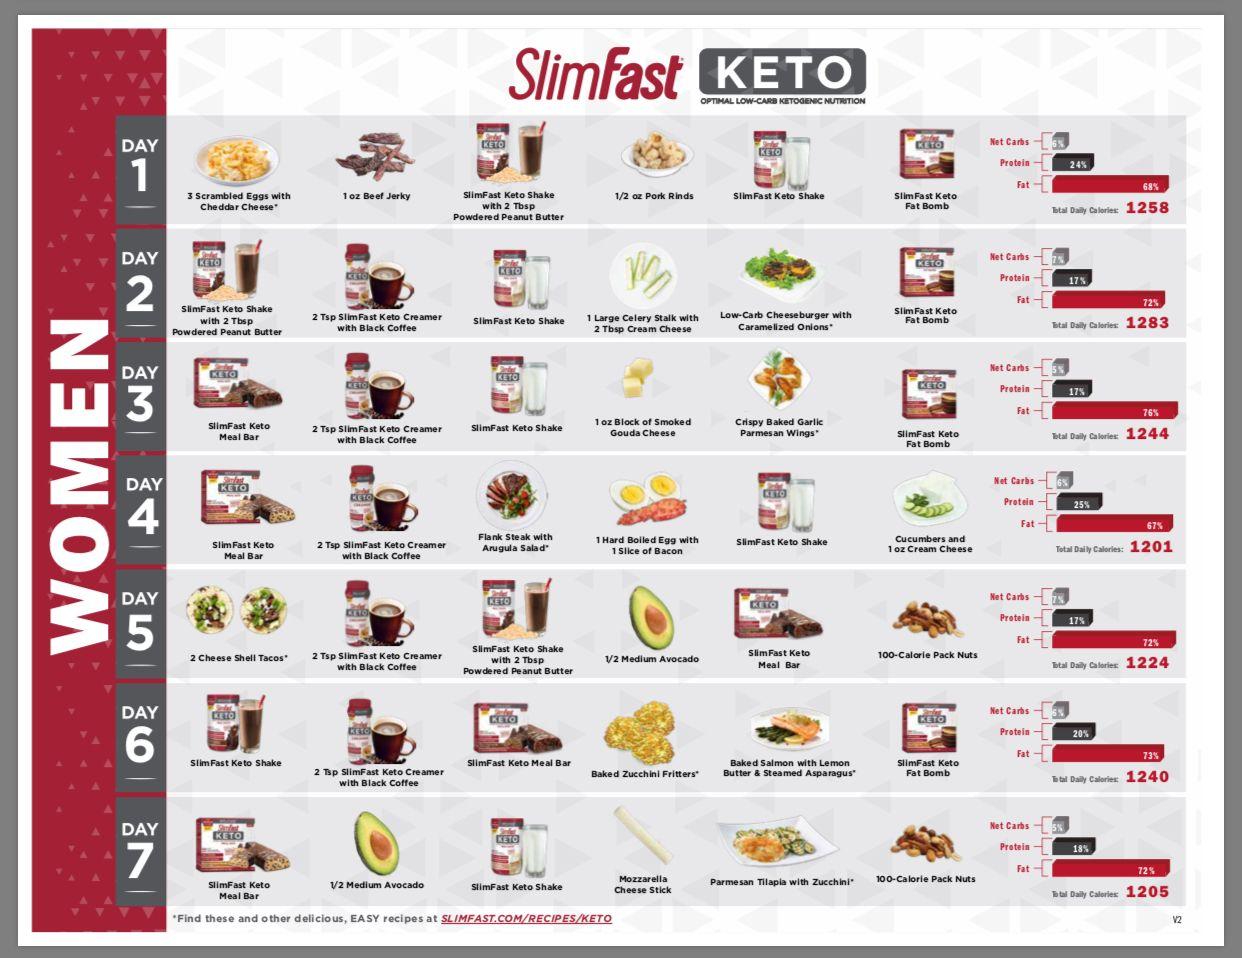 Keto 7 Day Meal Plan Women Slimfast Slim Fast Diet Slim Fast Diet Plan Meal Plan Women